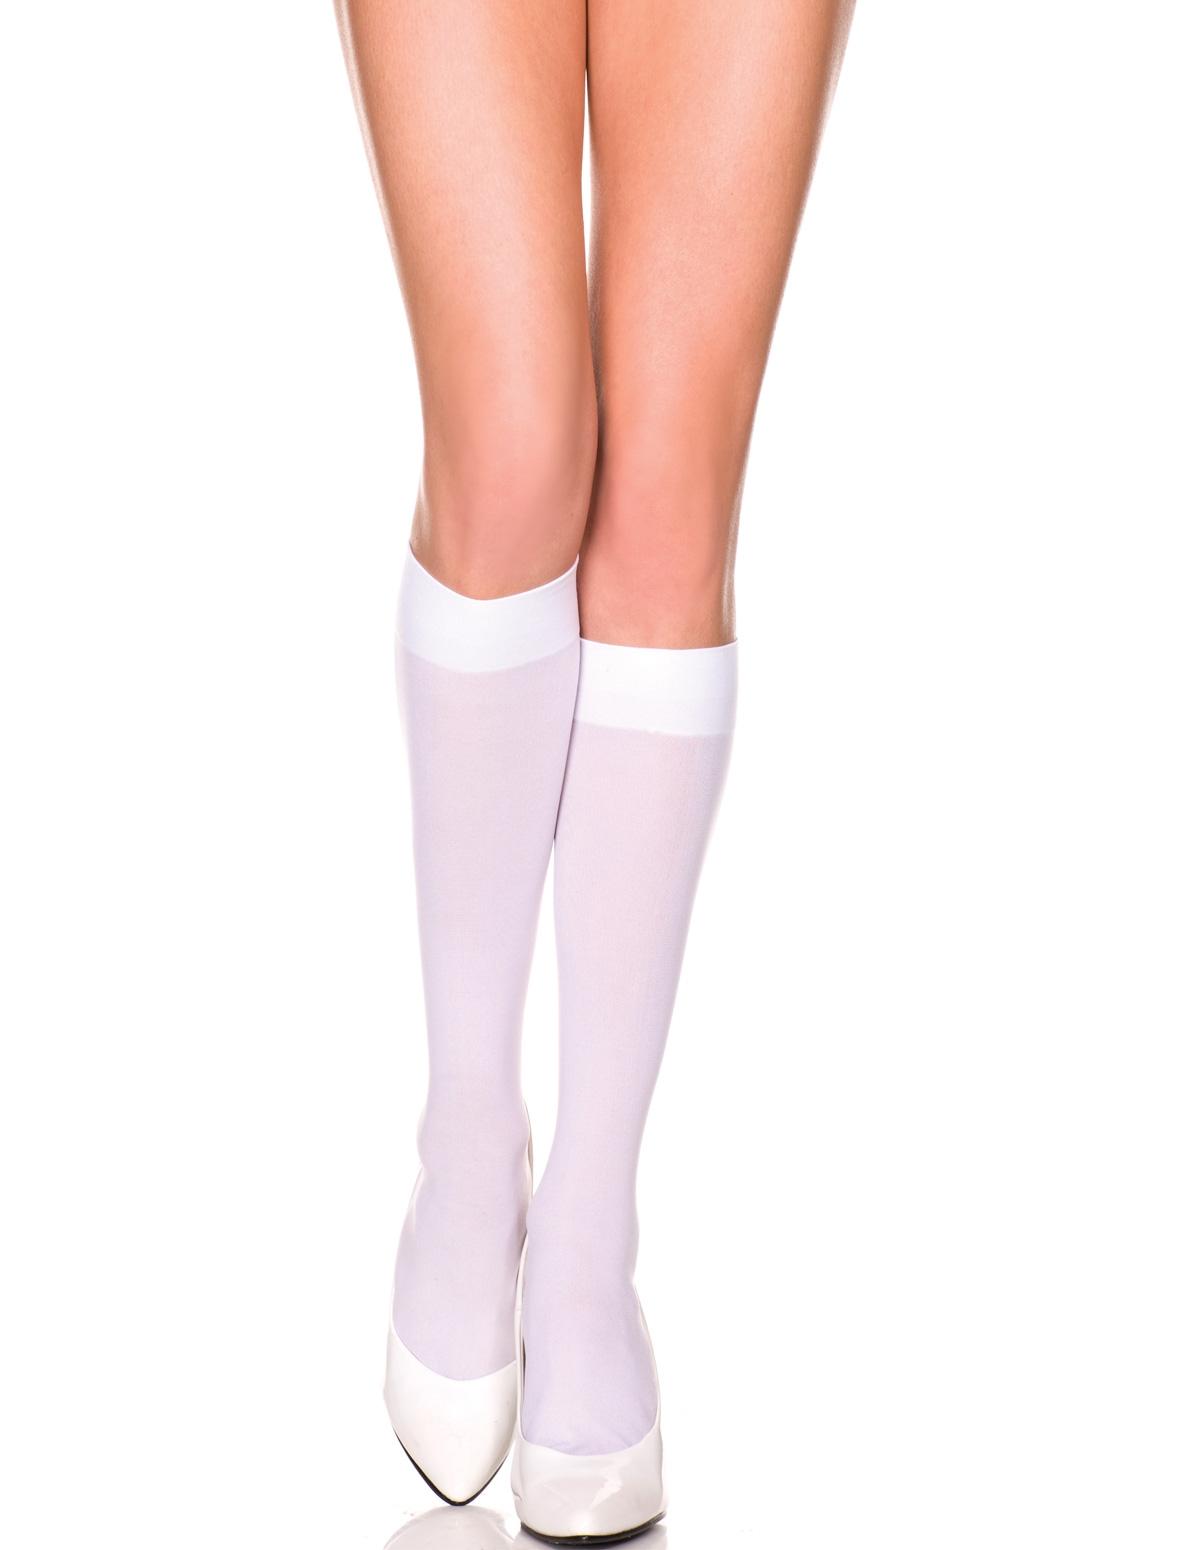 Opaque Knee High Socks